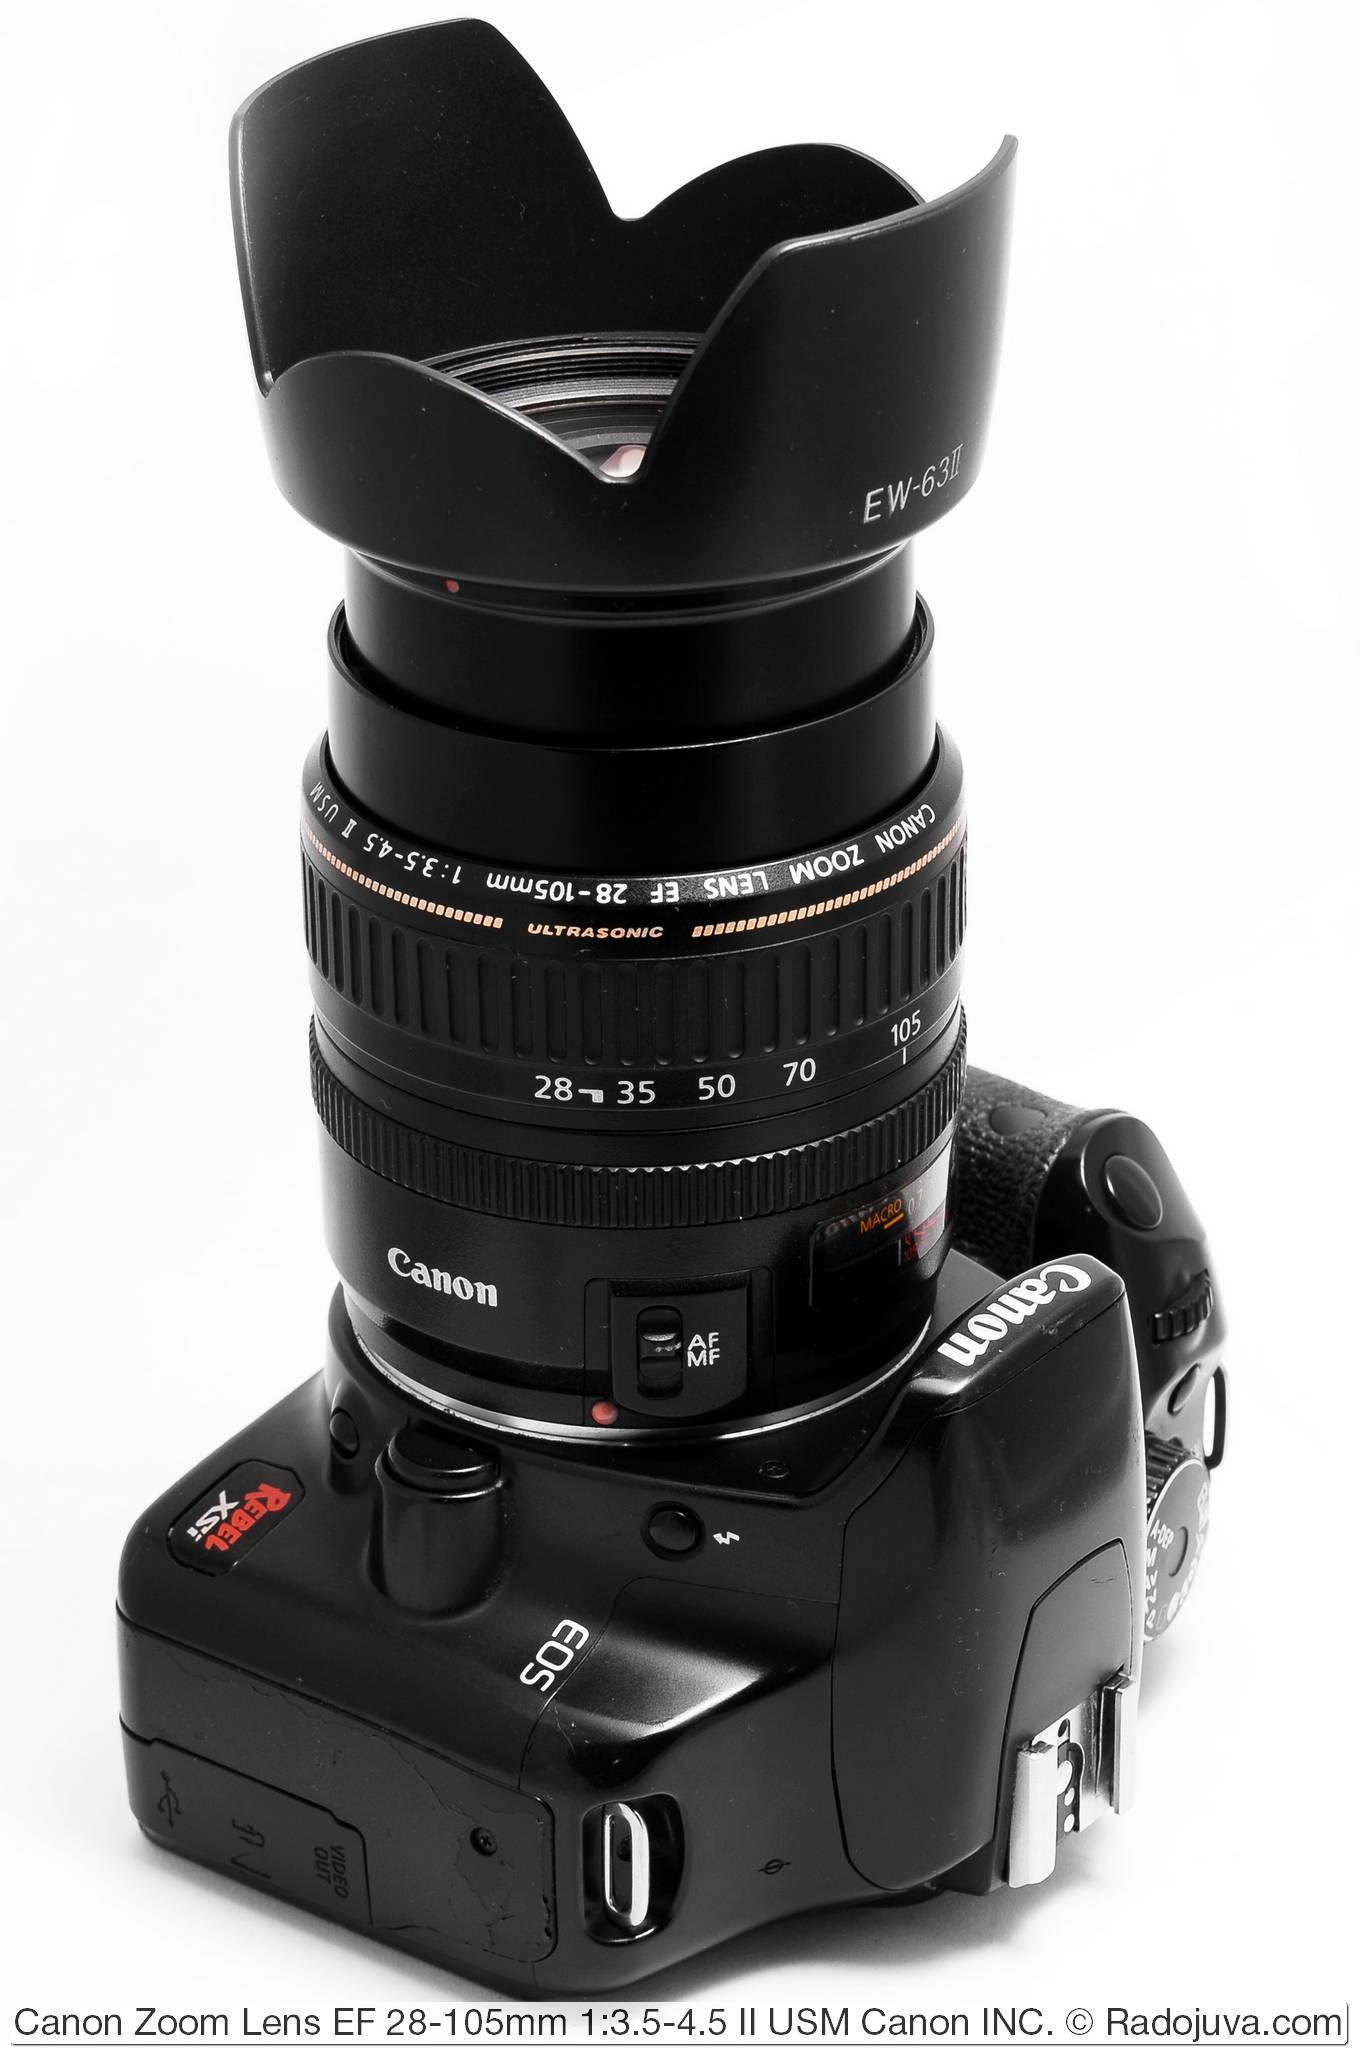 Canon Zoom Lens EF 28-105mm 1:3.5-4.5 II USM Canon INC.